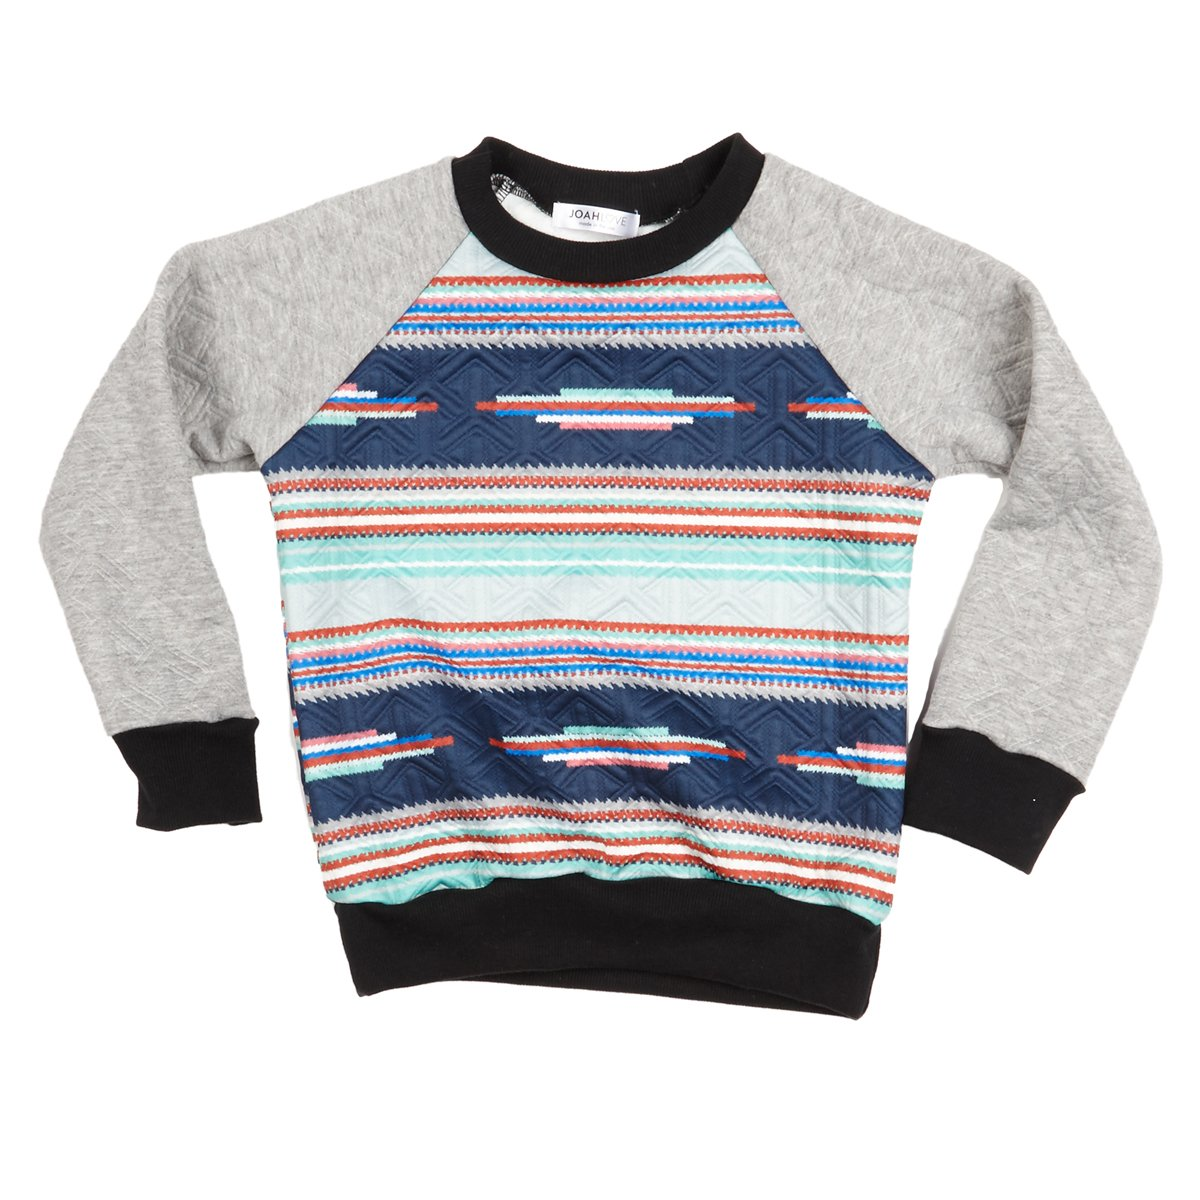 Joah Love Big Boys' Gordon Quilted Sweatshirt, 2